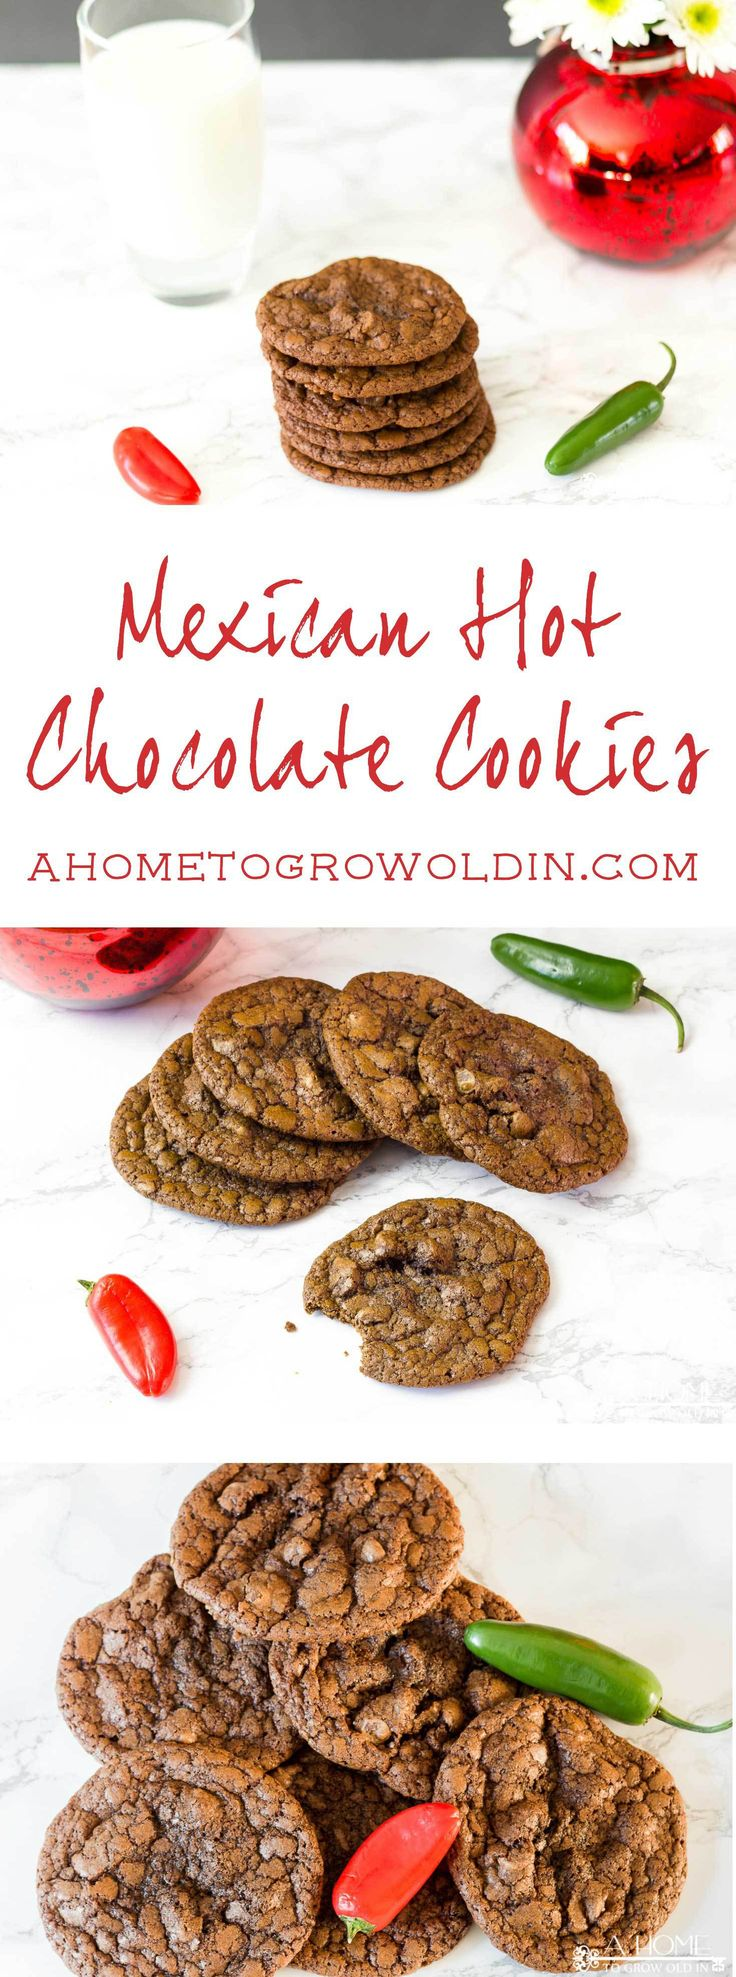 Best 25+ Love chocolate ideas on Pinterest | Choco chocolate ...